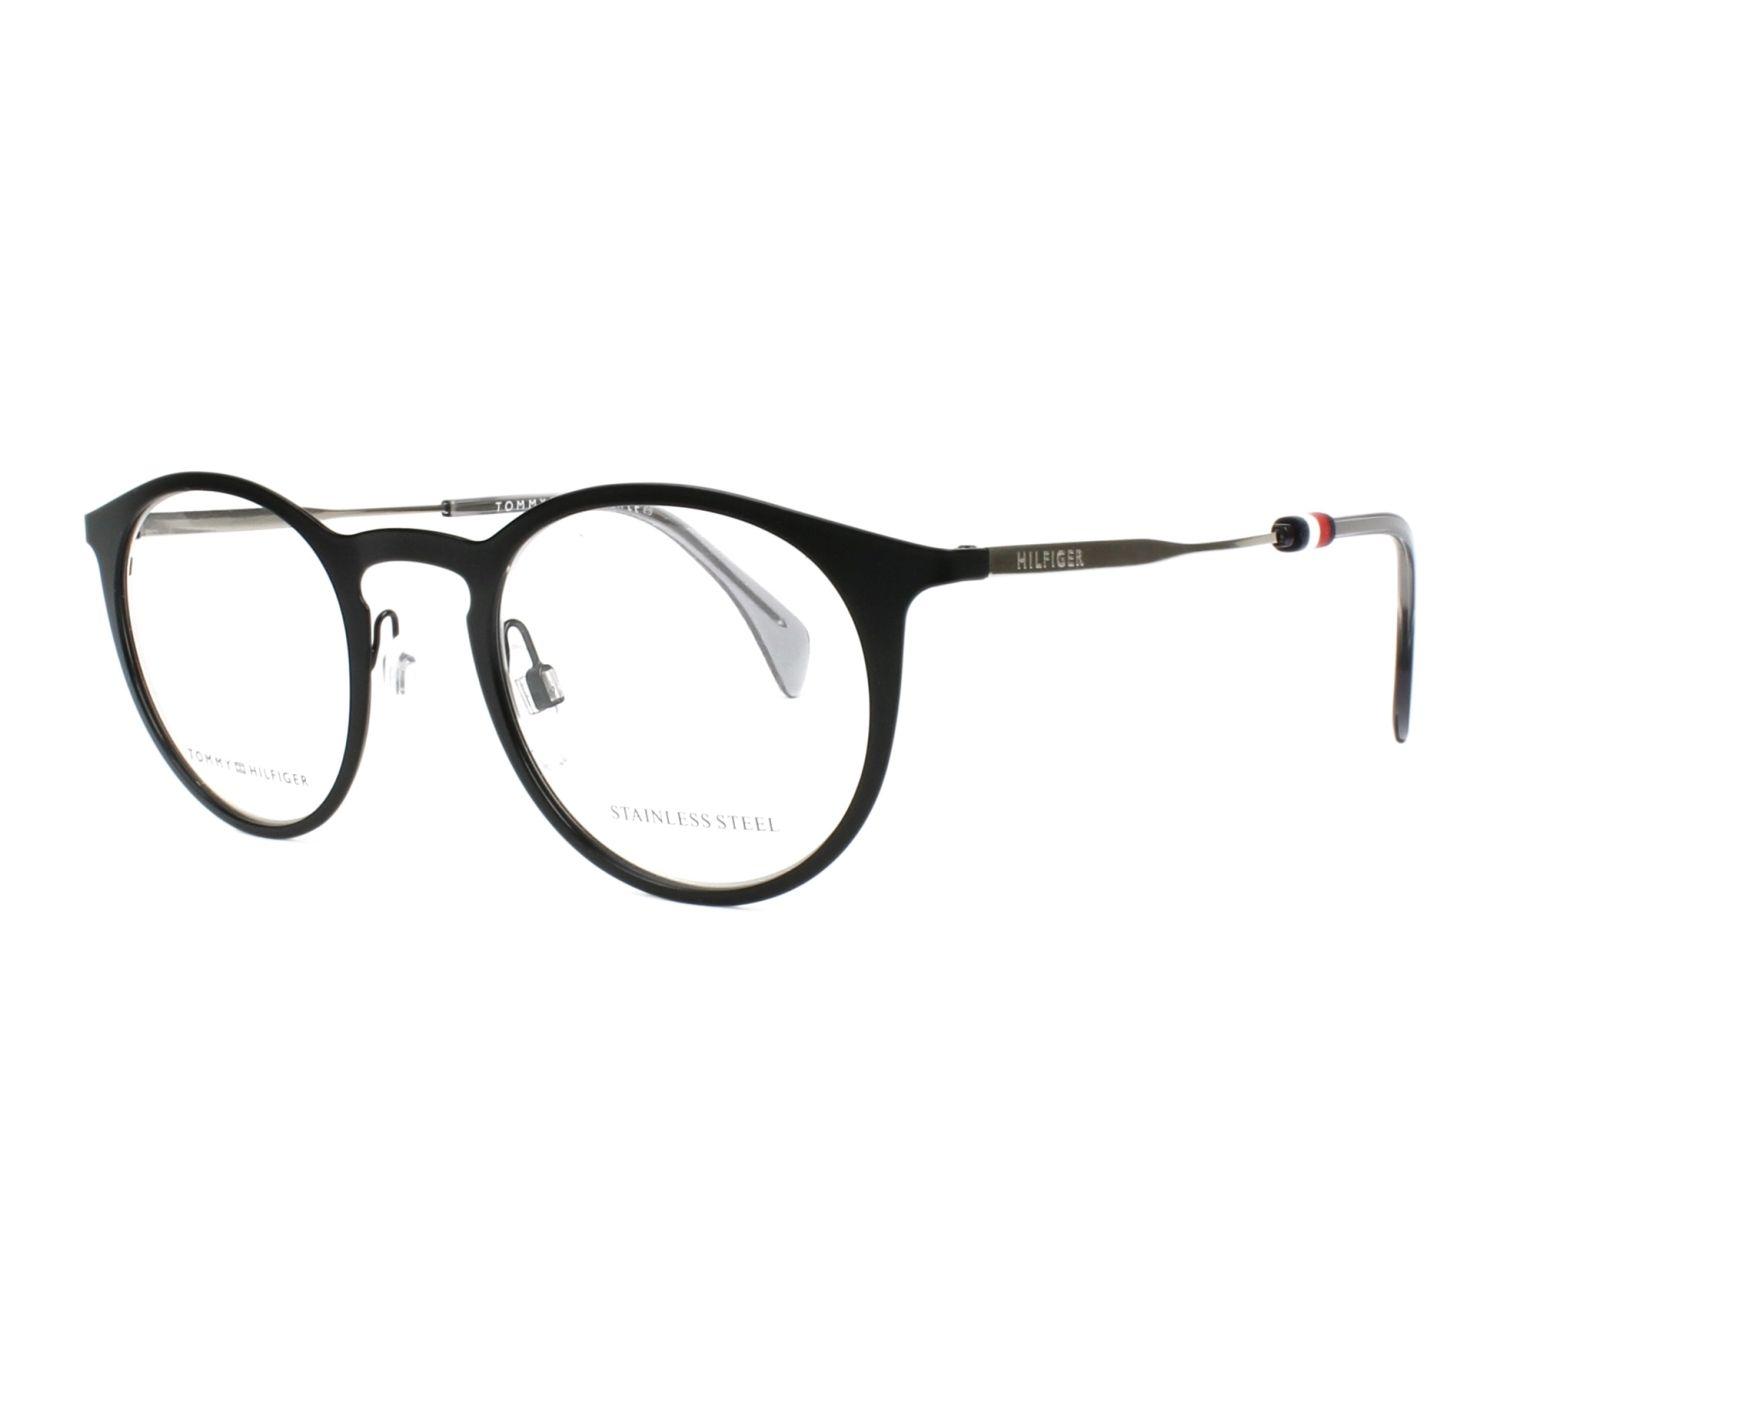 4d475526 eyeglasses Tommy Hilfiger TH-1514 807 48-22 Black Silver profile view